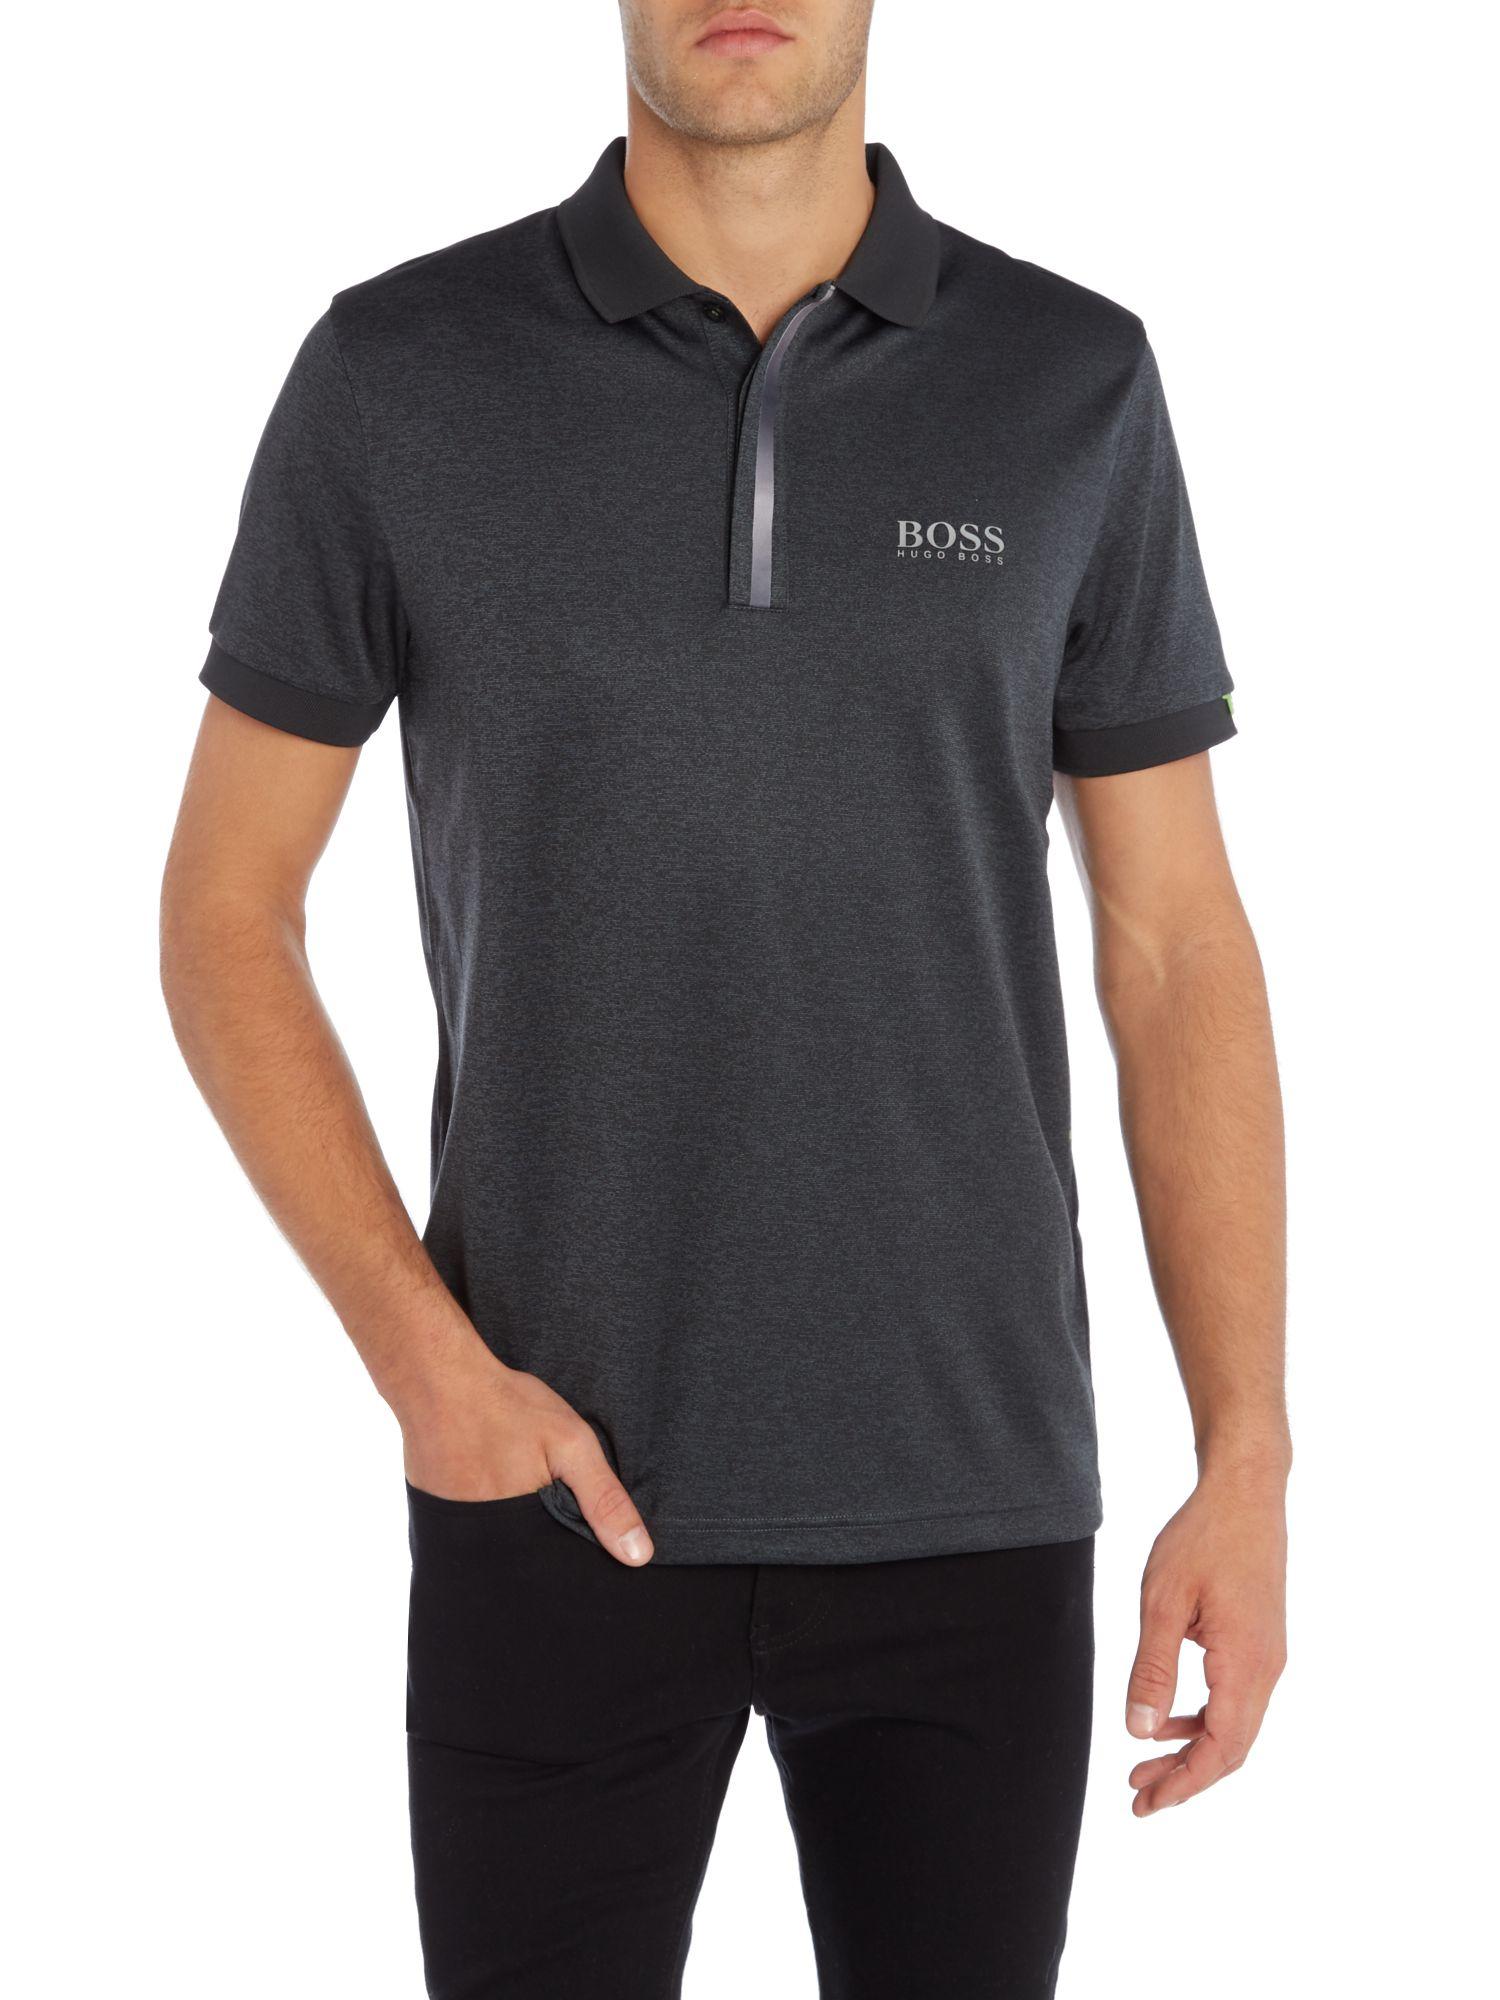 6bce24c6c Hugo Boss Green Paddy 5 Dot Print Polo Shirt – EDGE Engineering and ...